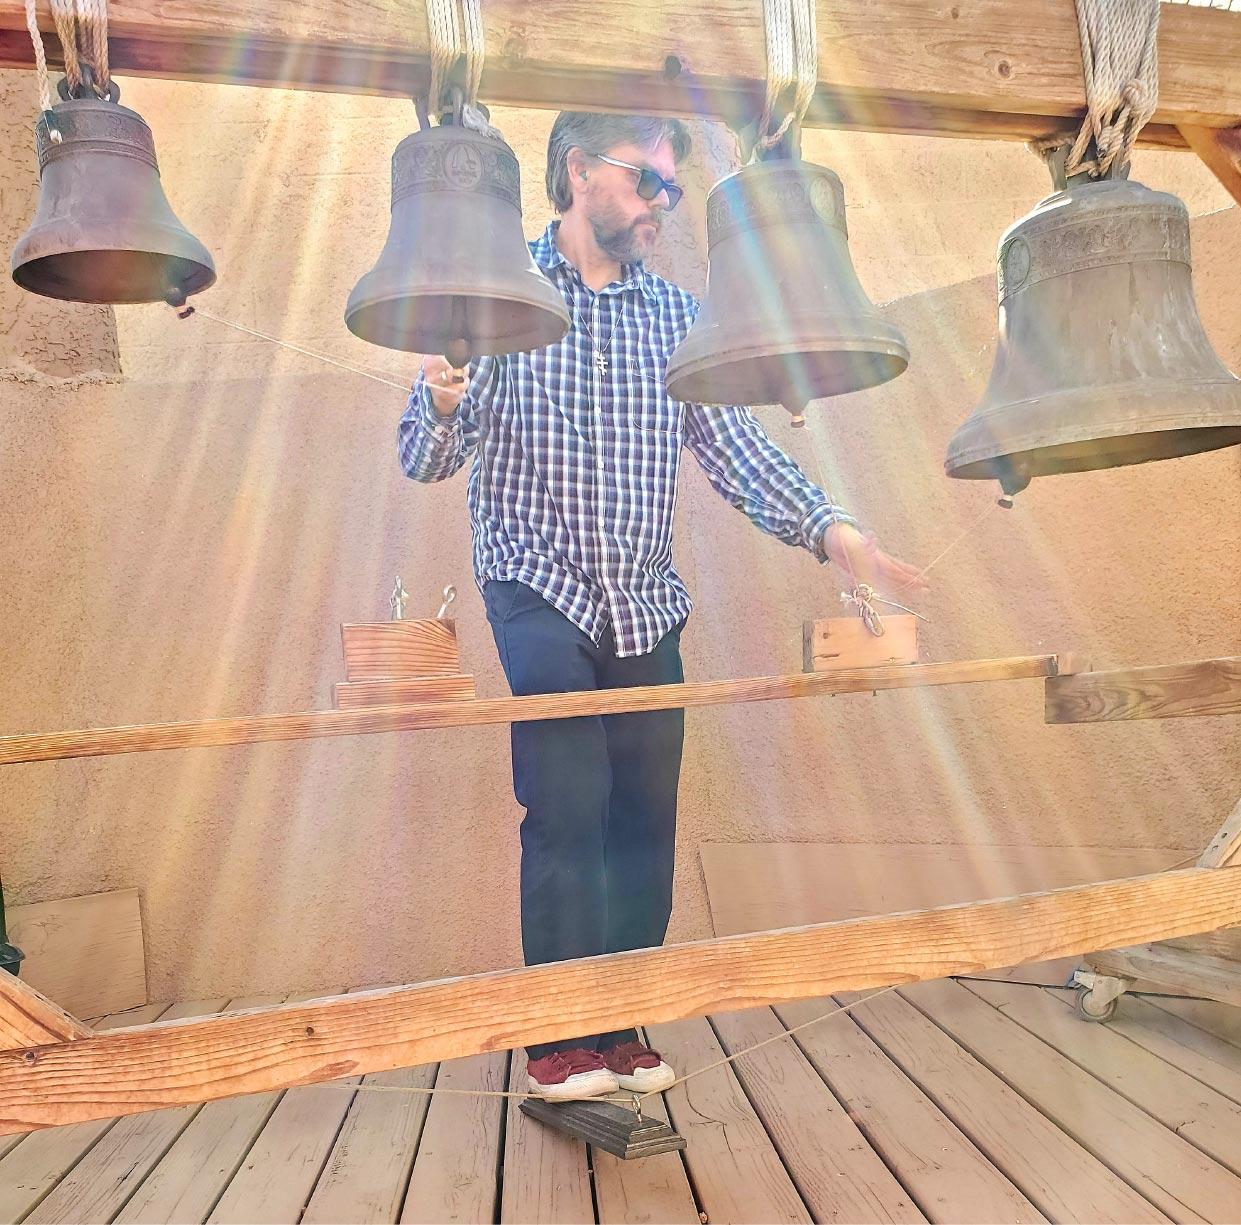 Michael Hayden ringing church bells